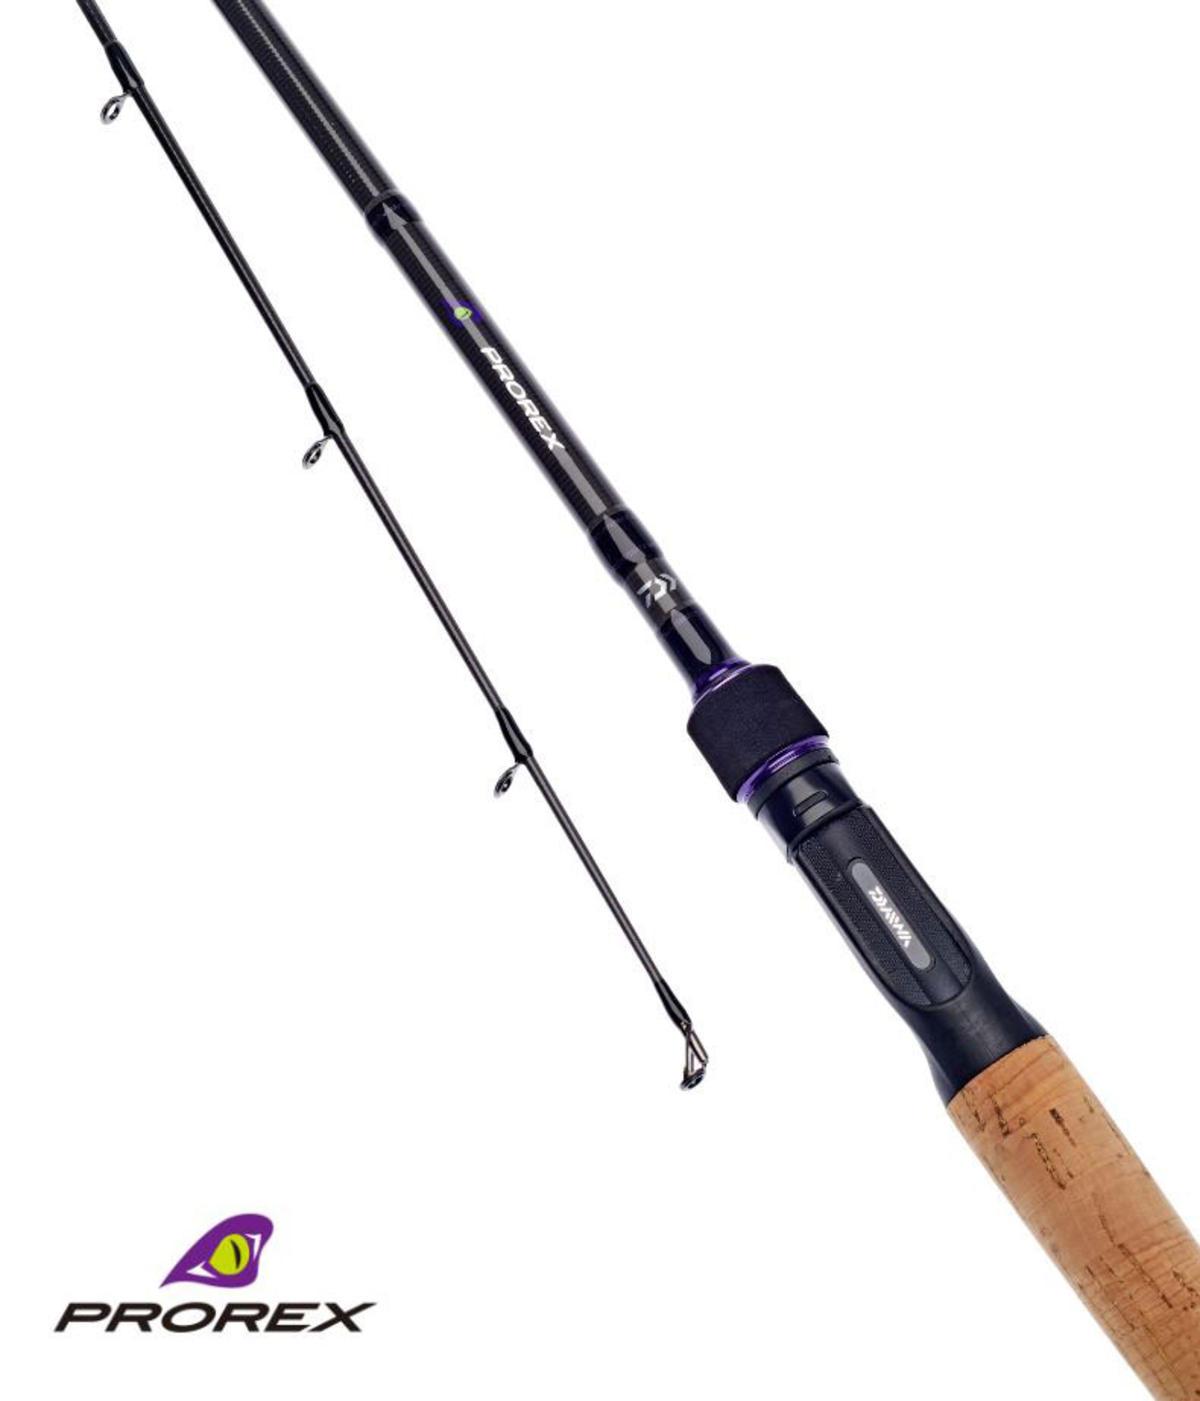 New Daiwa Prorex S Baitcasting Spinning Rods Pike / Predator - All Models